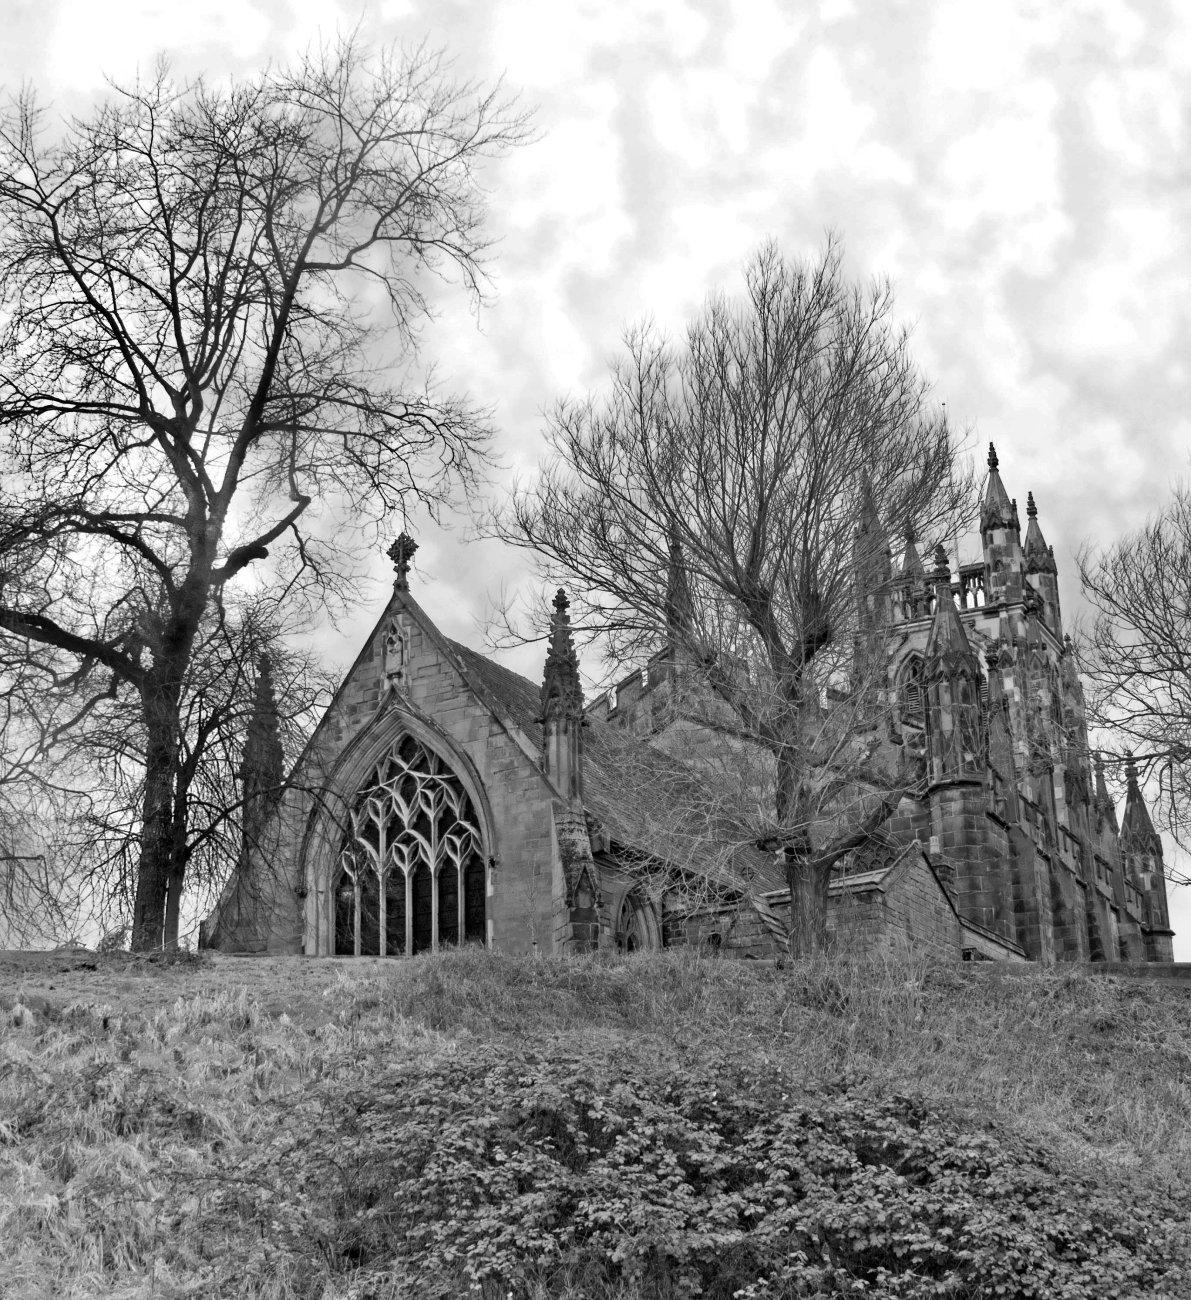 St. Mary's Church, Stockport.